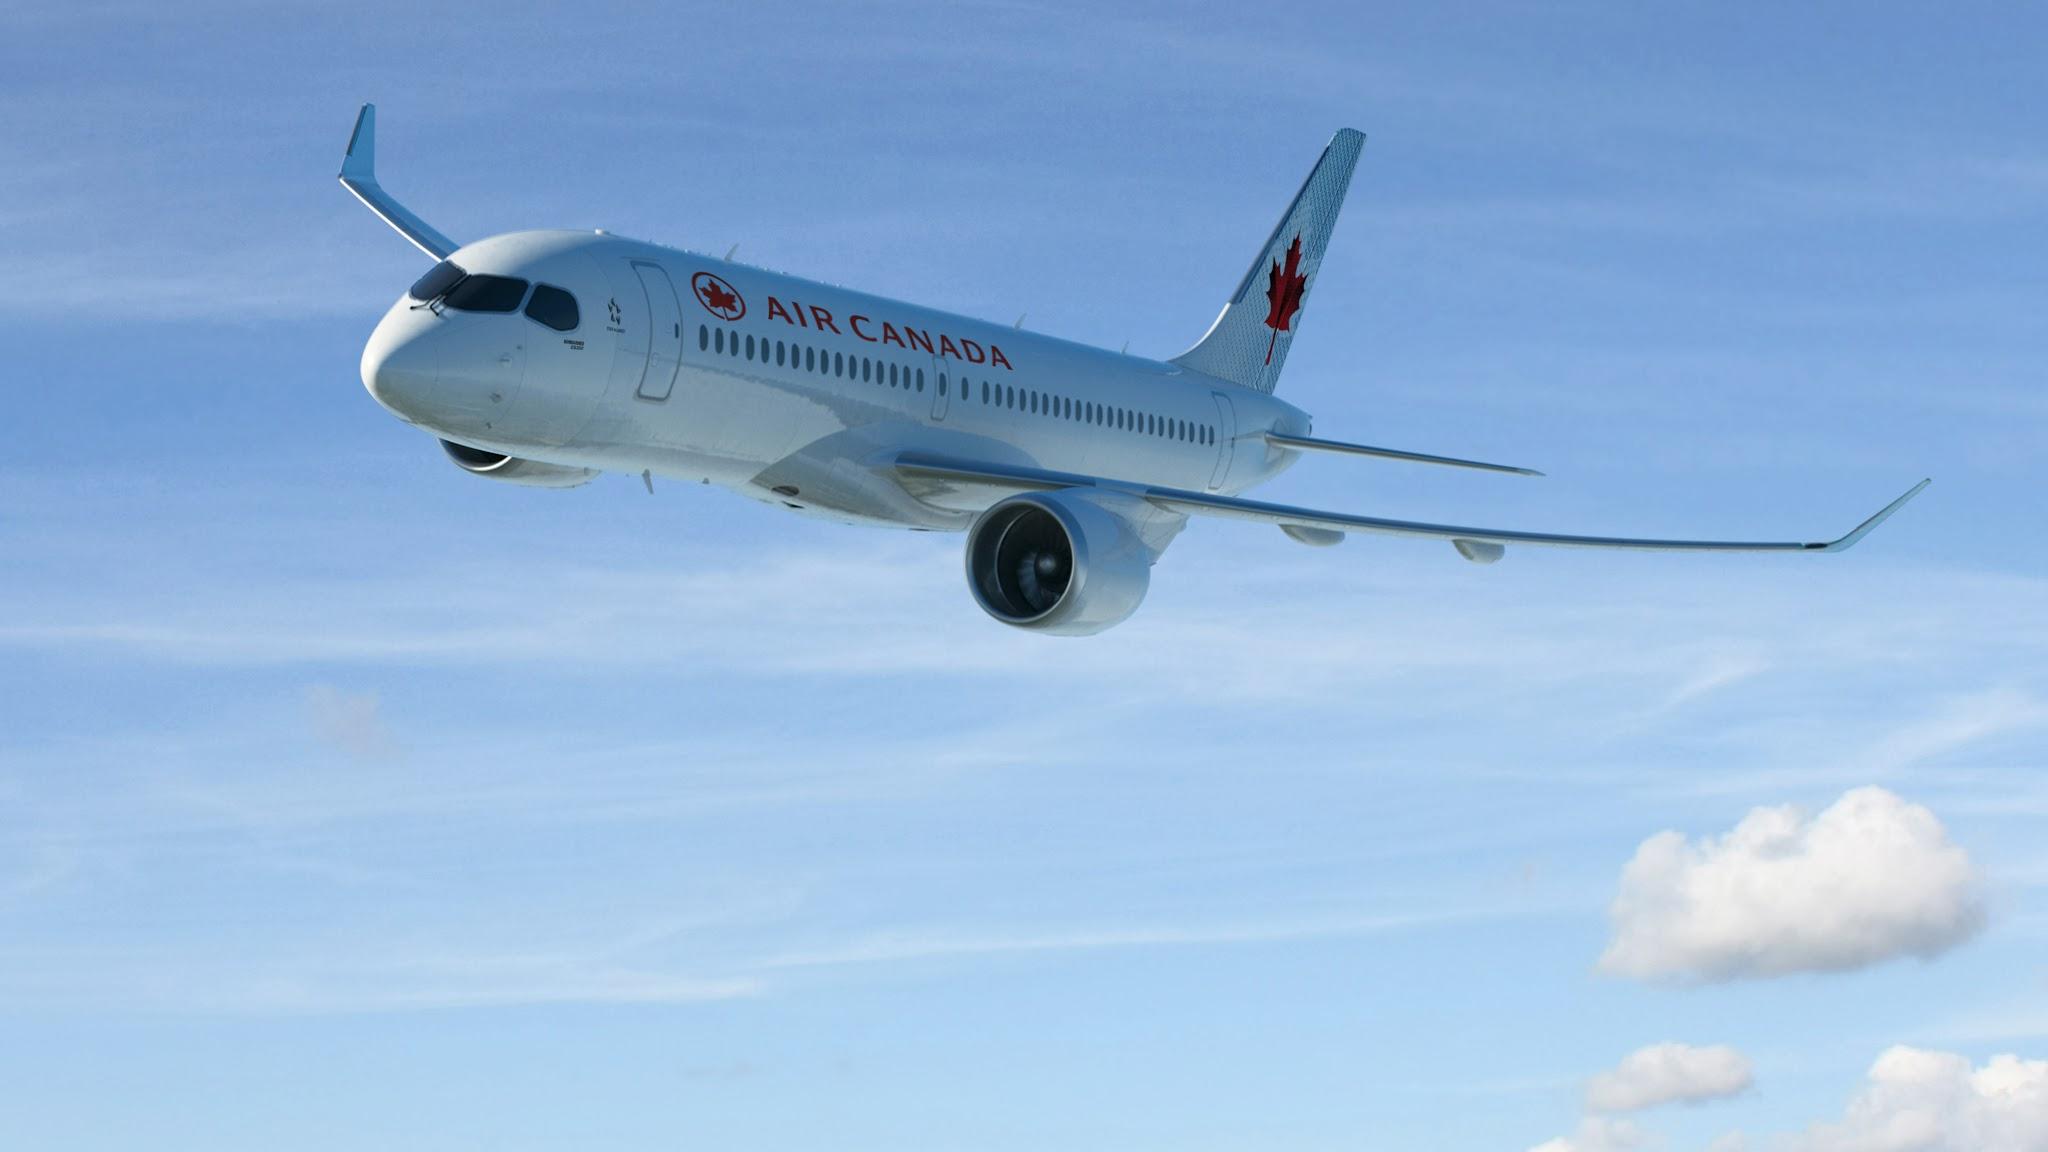 Air Canada encomenda 75 Bombardier C Series